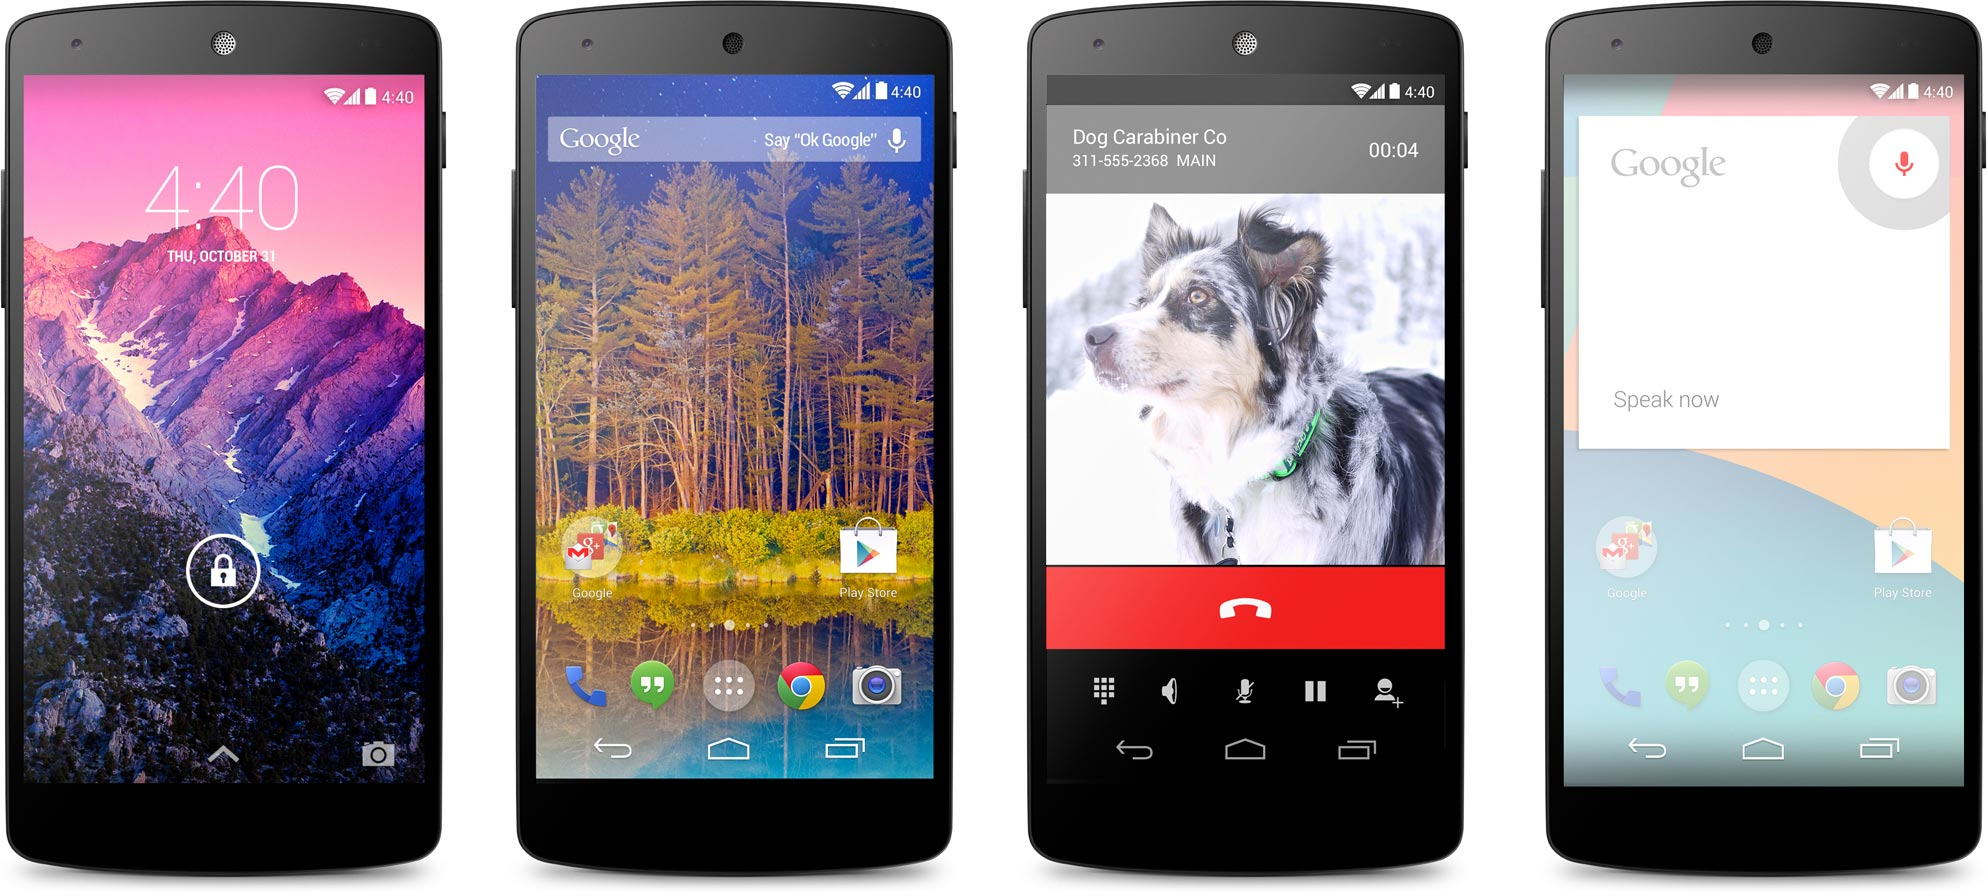 Google Nexus 5 coming to T-Mobile